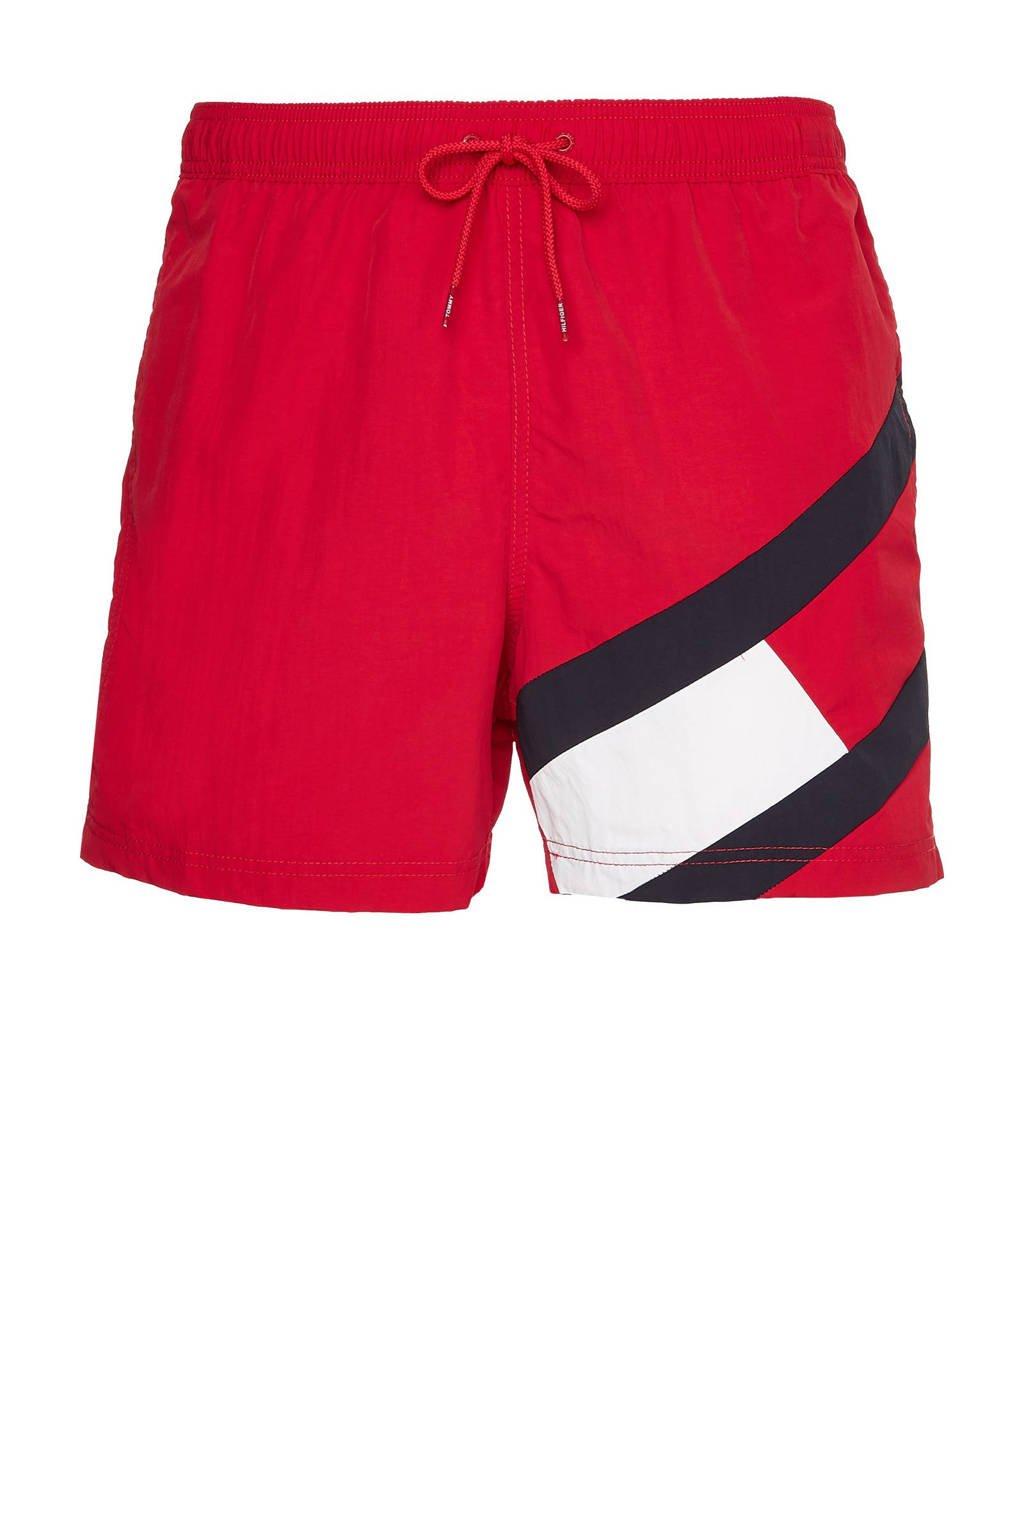 Tommy Hilfiger zwemshort rood, Rood